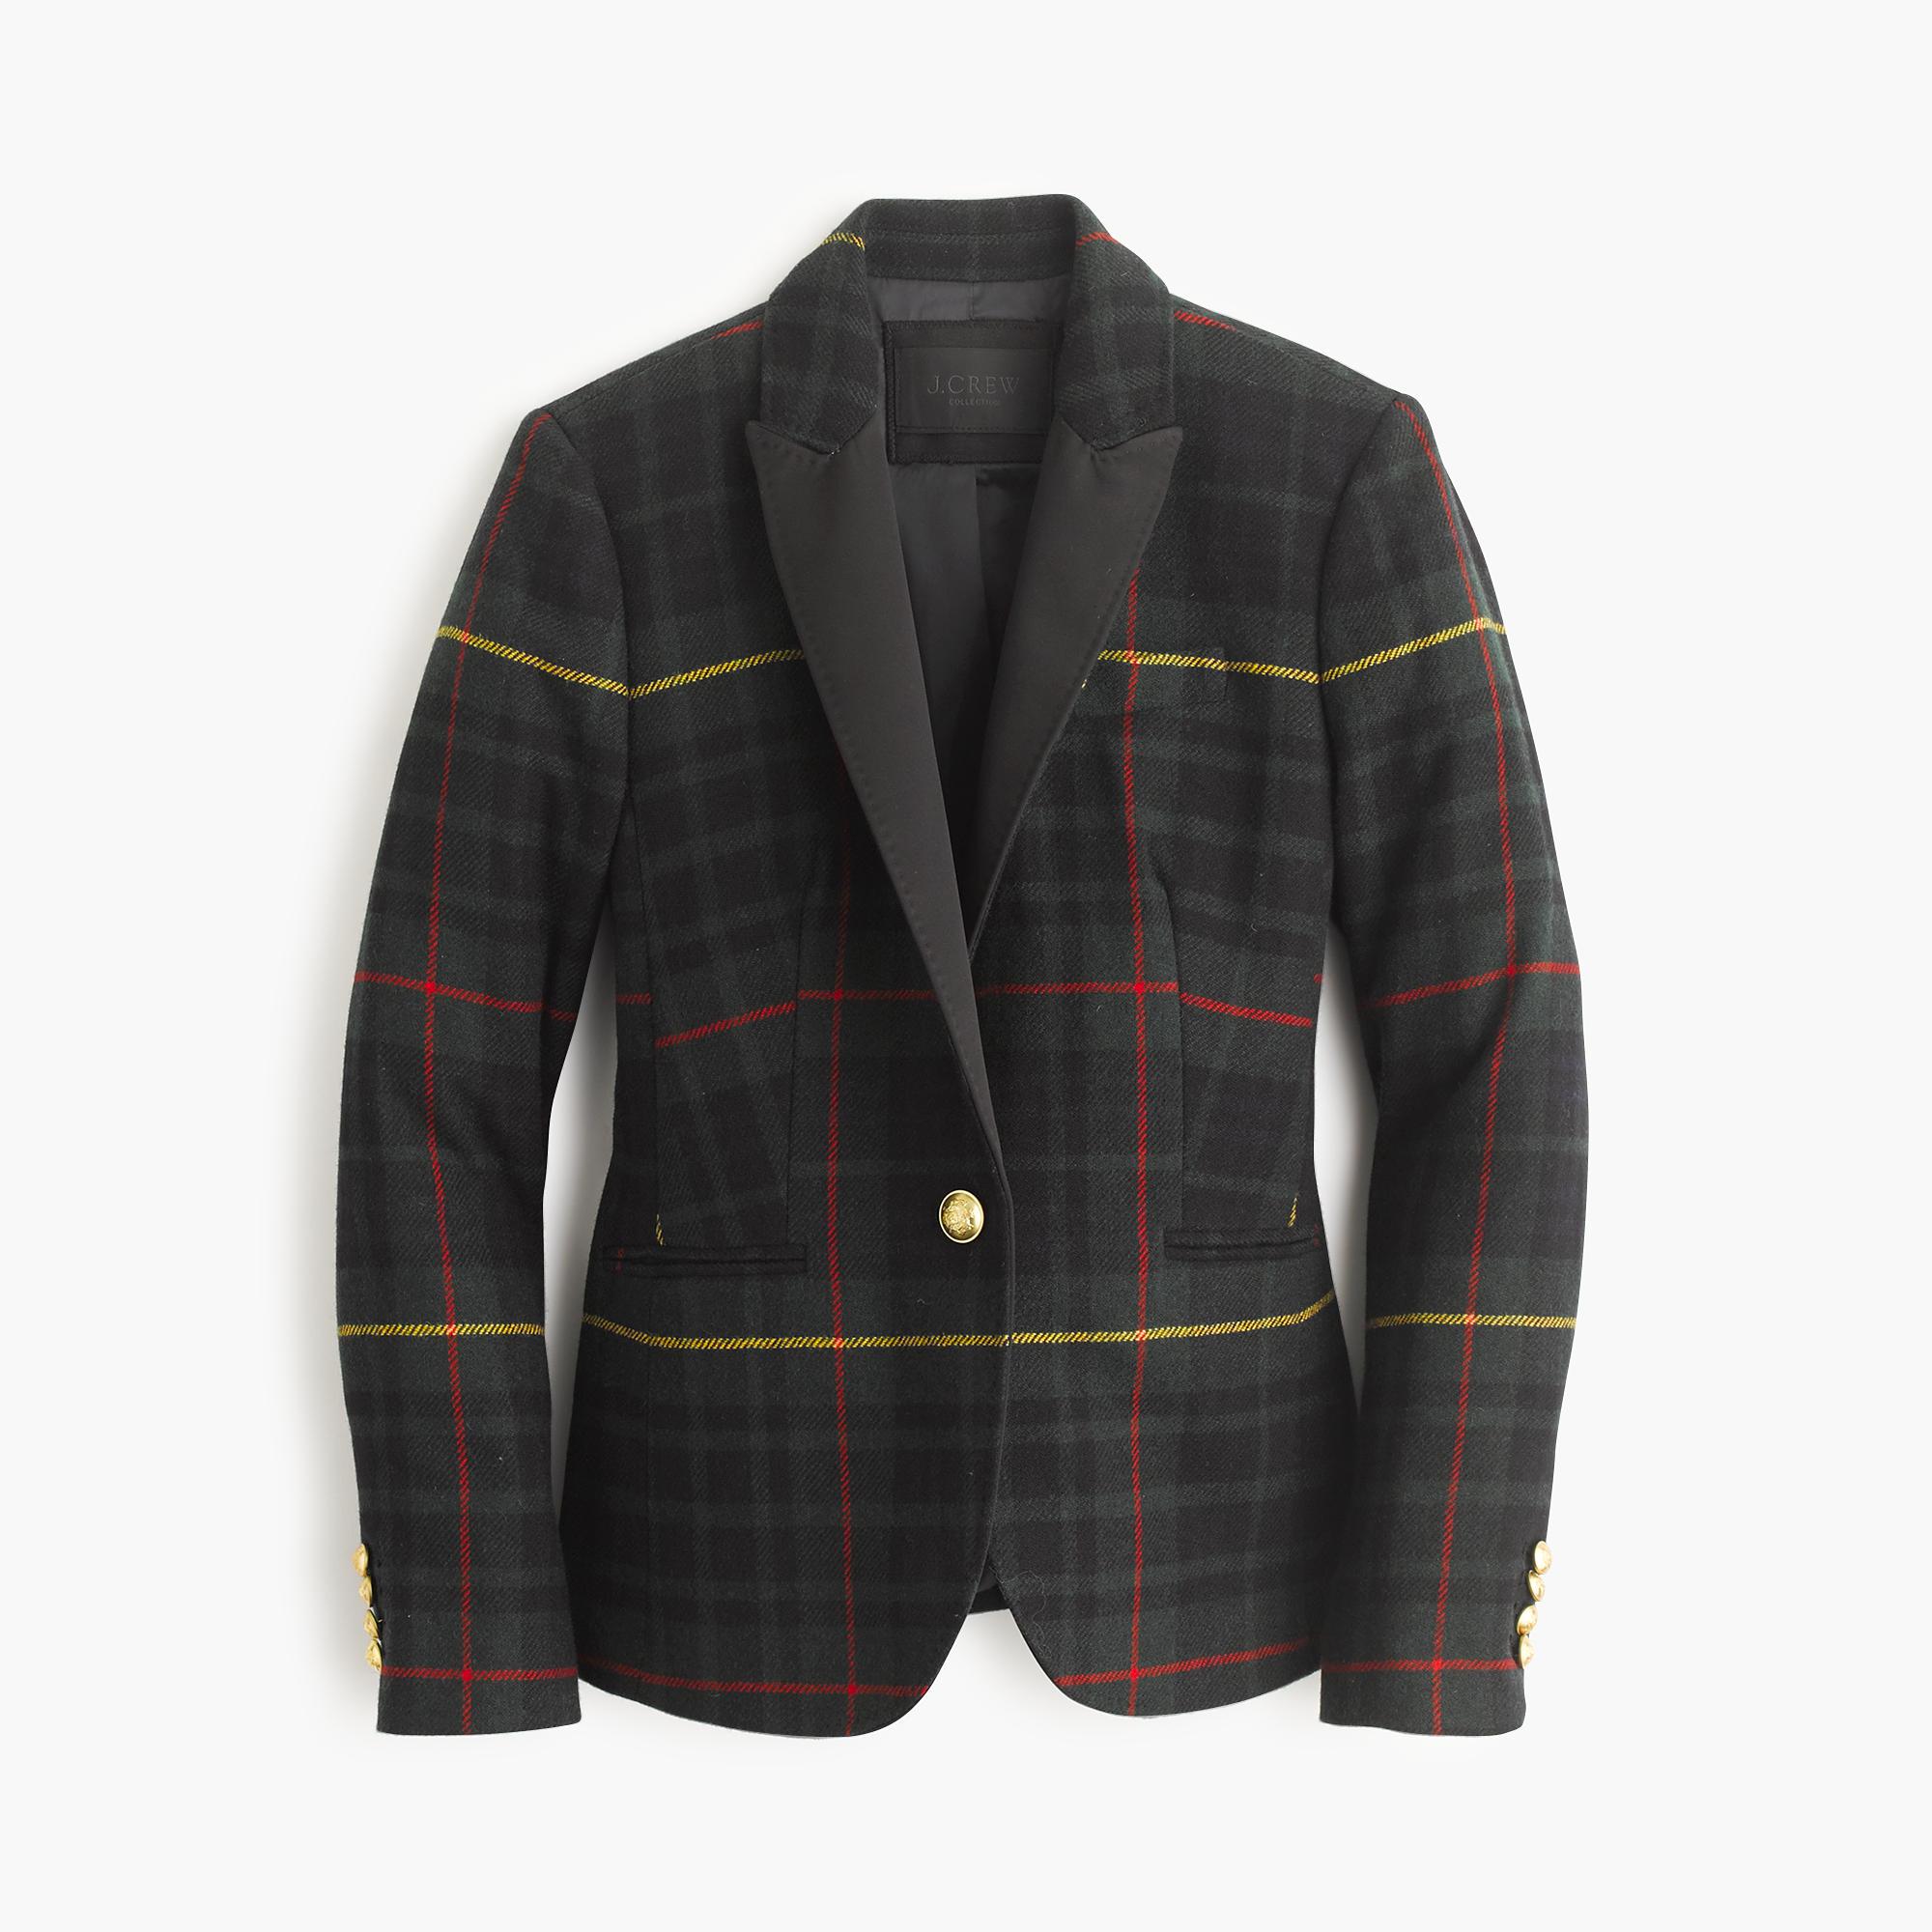 Collection Campbell Blazer In Tartan : Women's Jackets